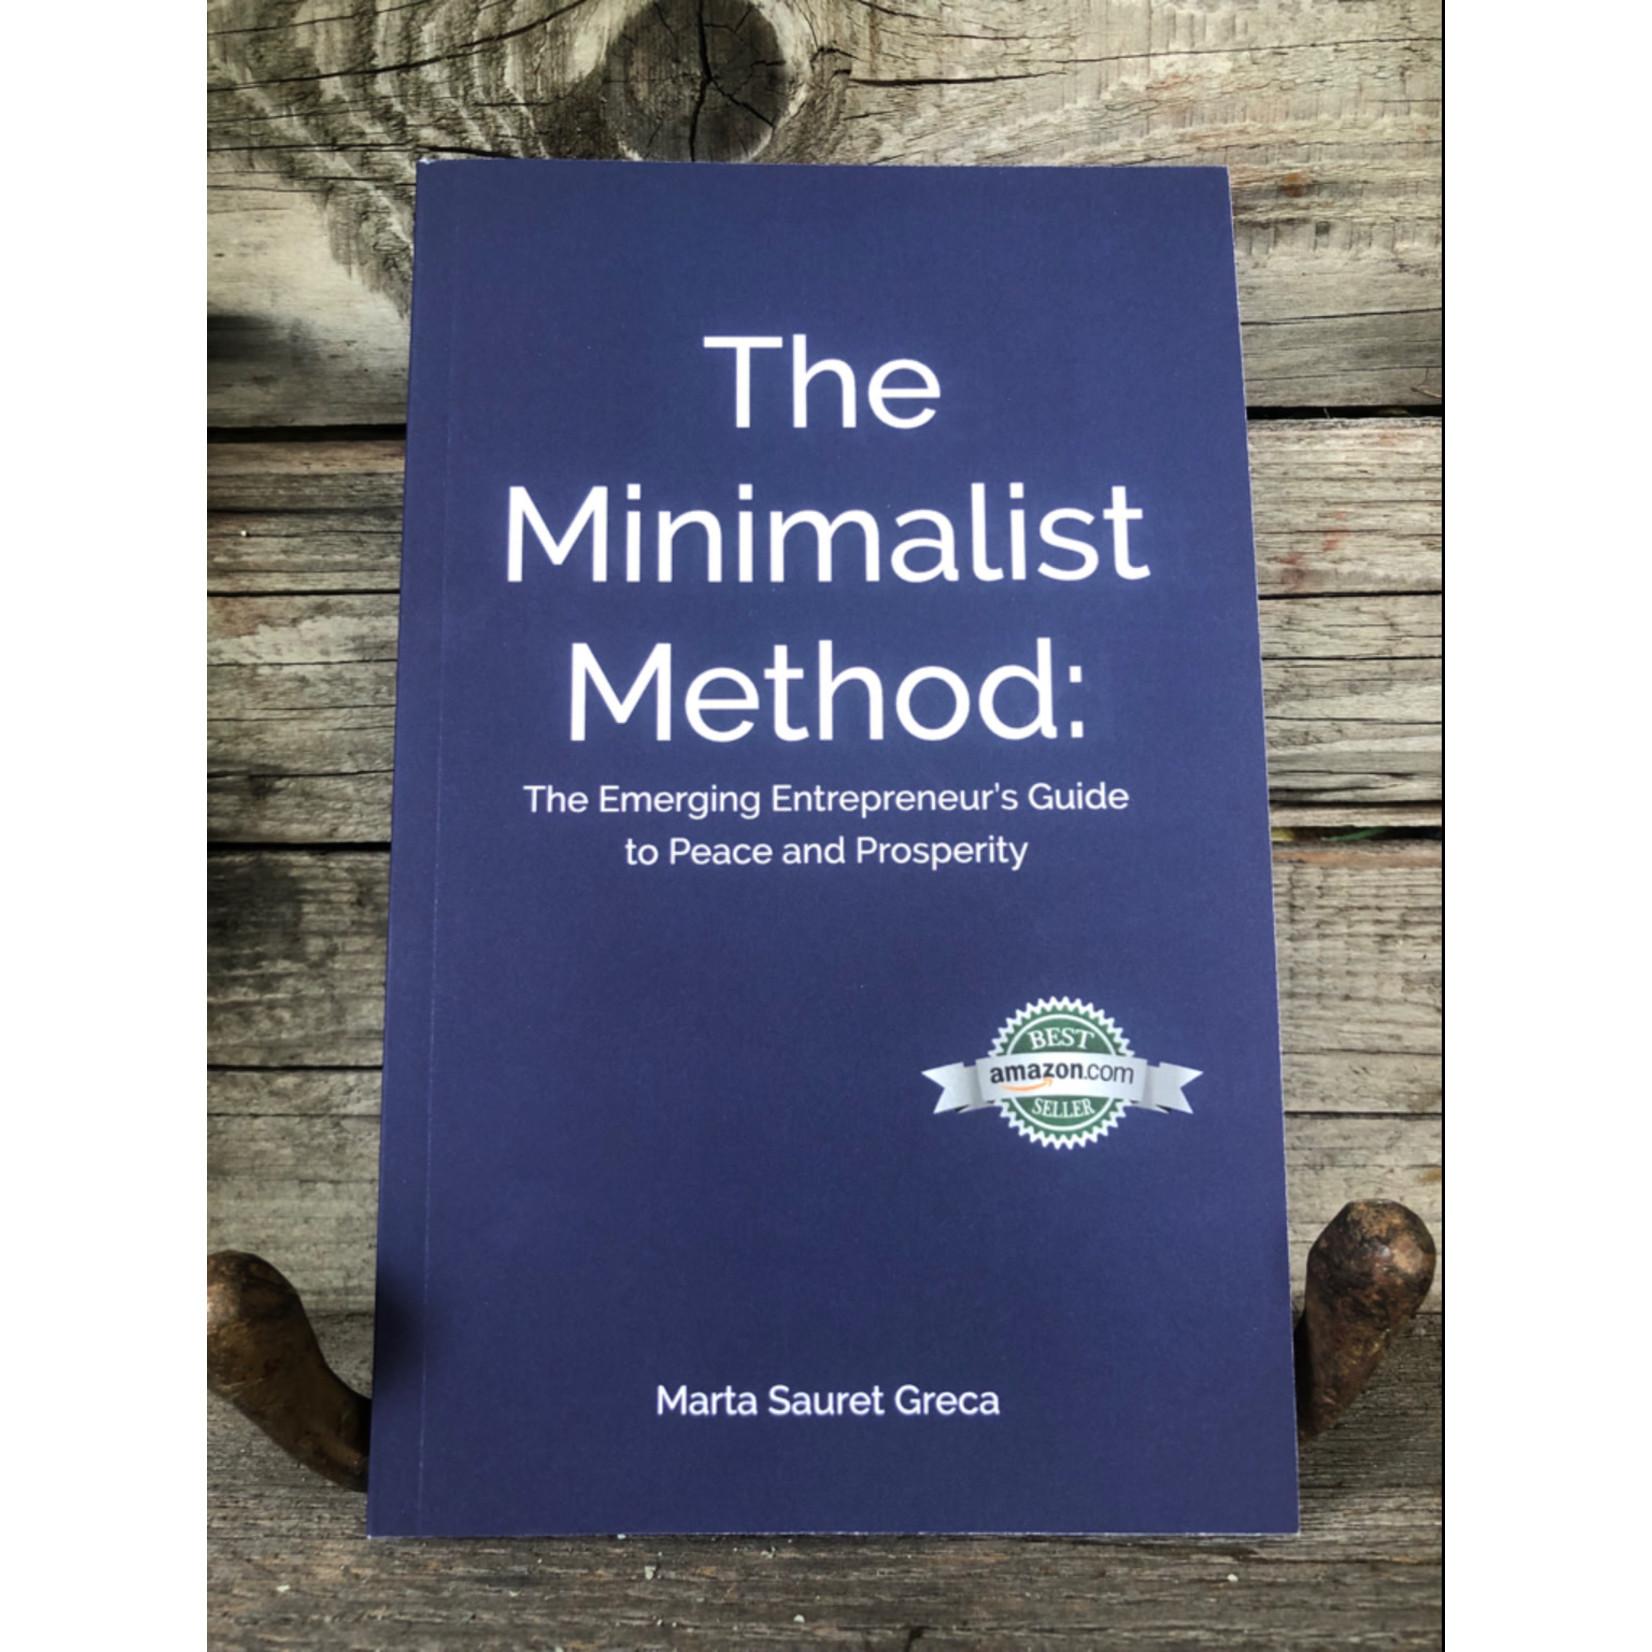 Marta Sauret Greca The Minimalist Method: Book written by Marta Sauret Greca